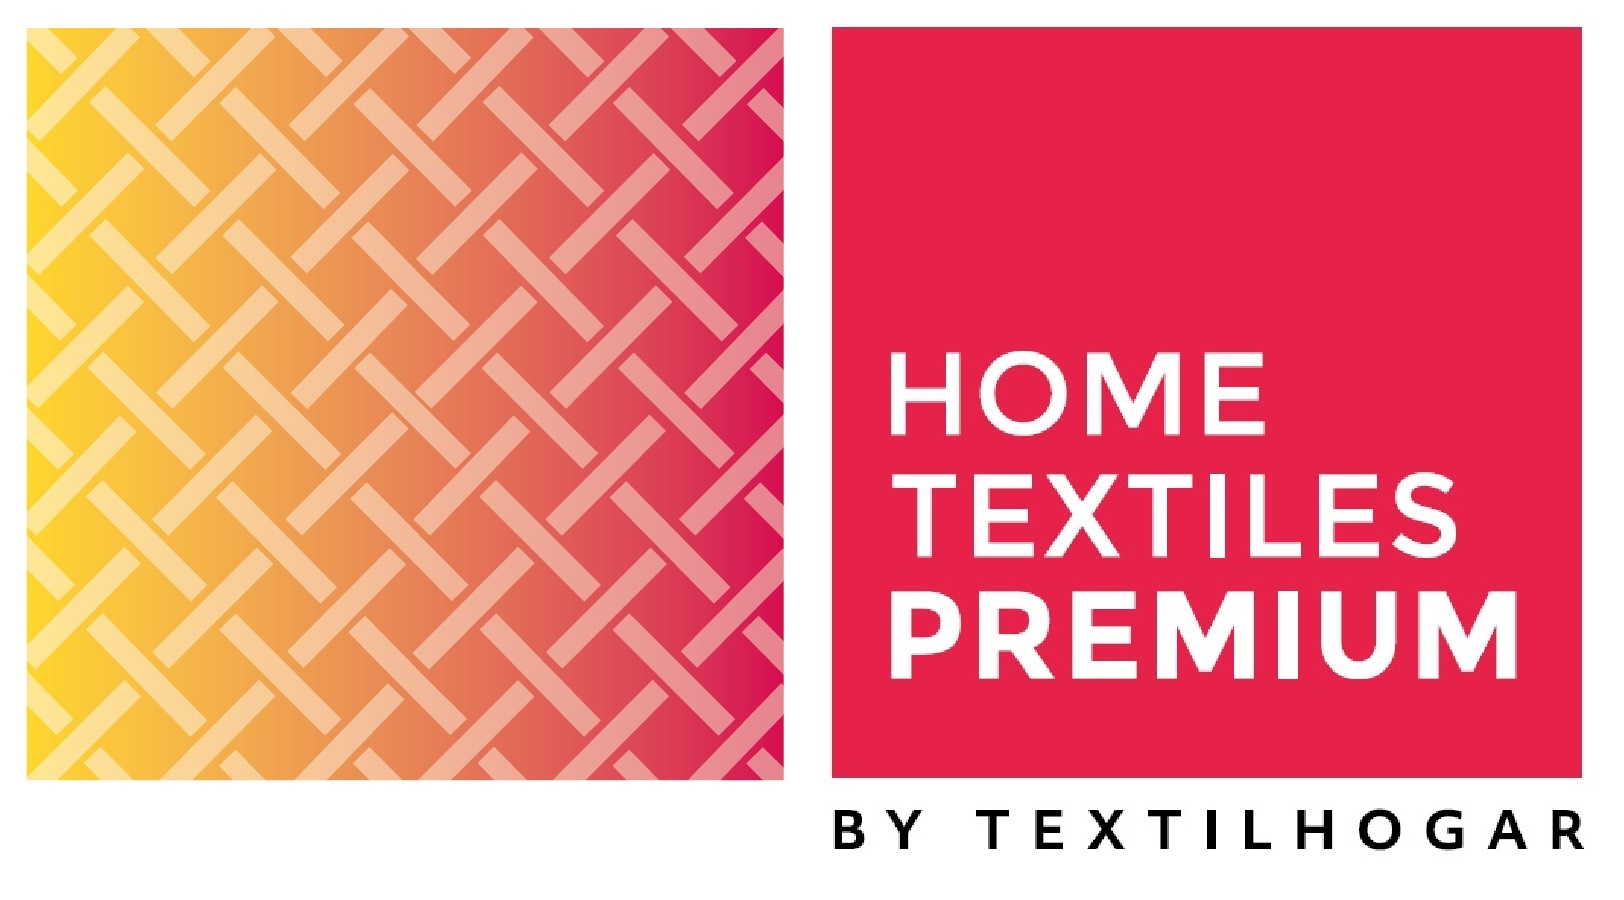 Home textiles | beds.es